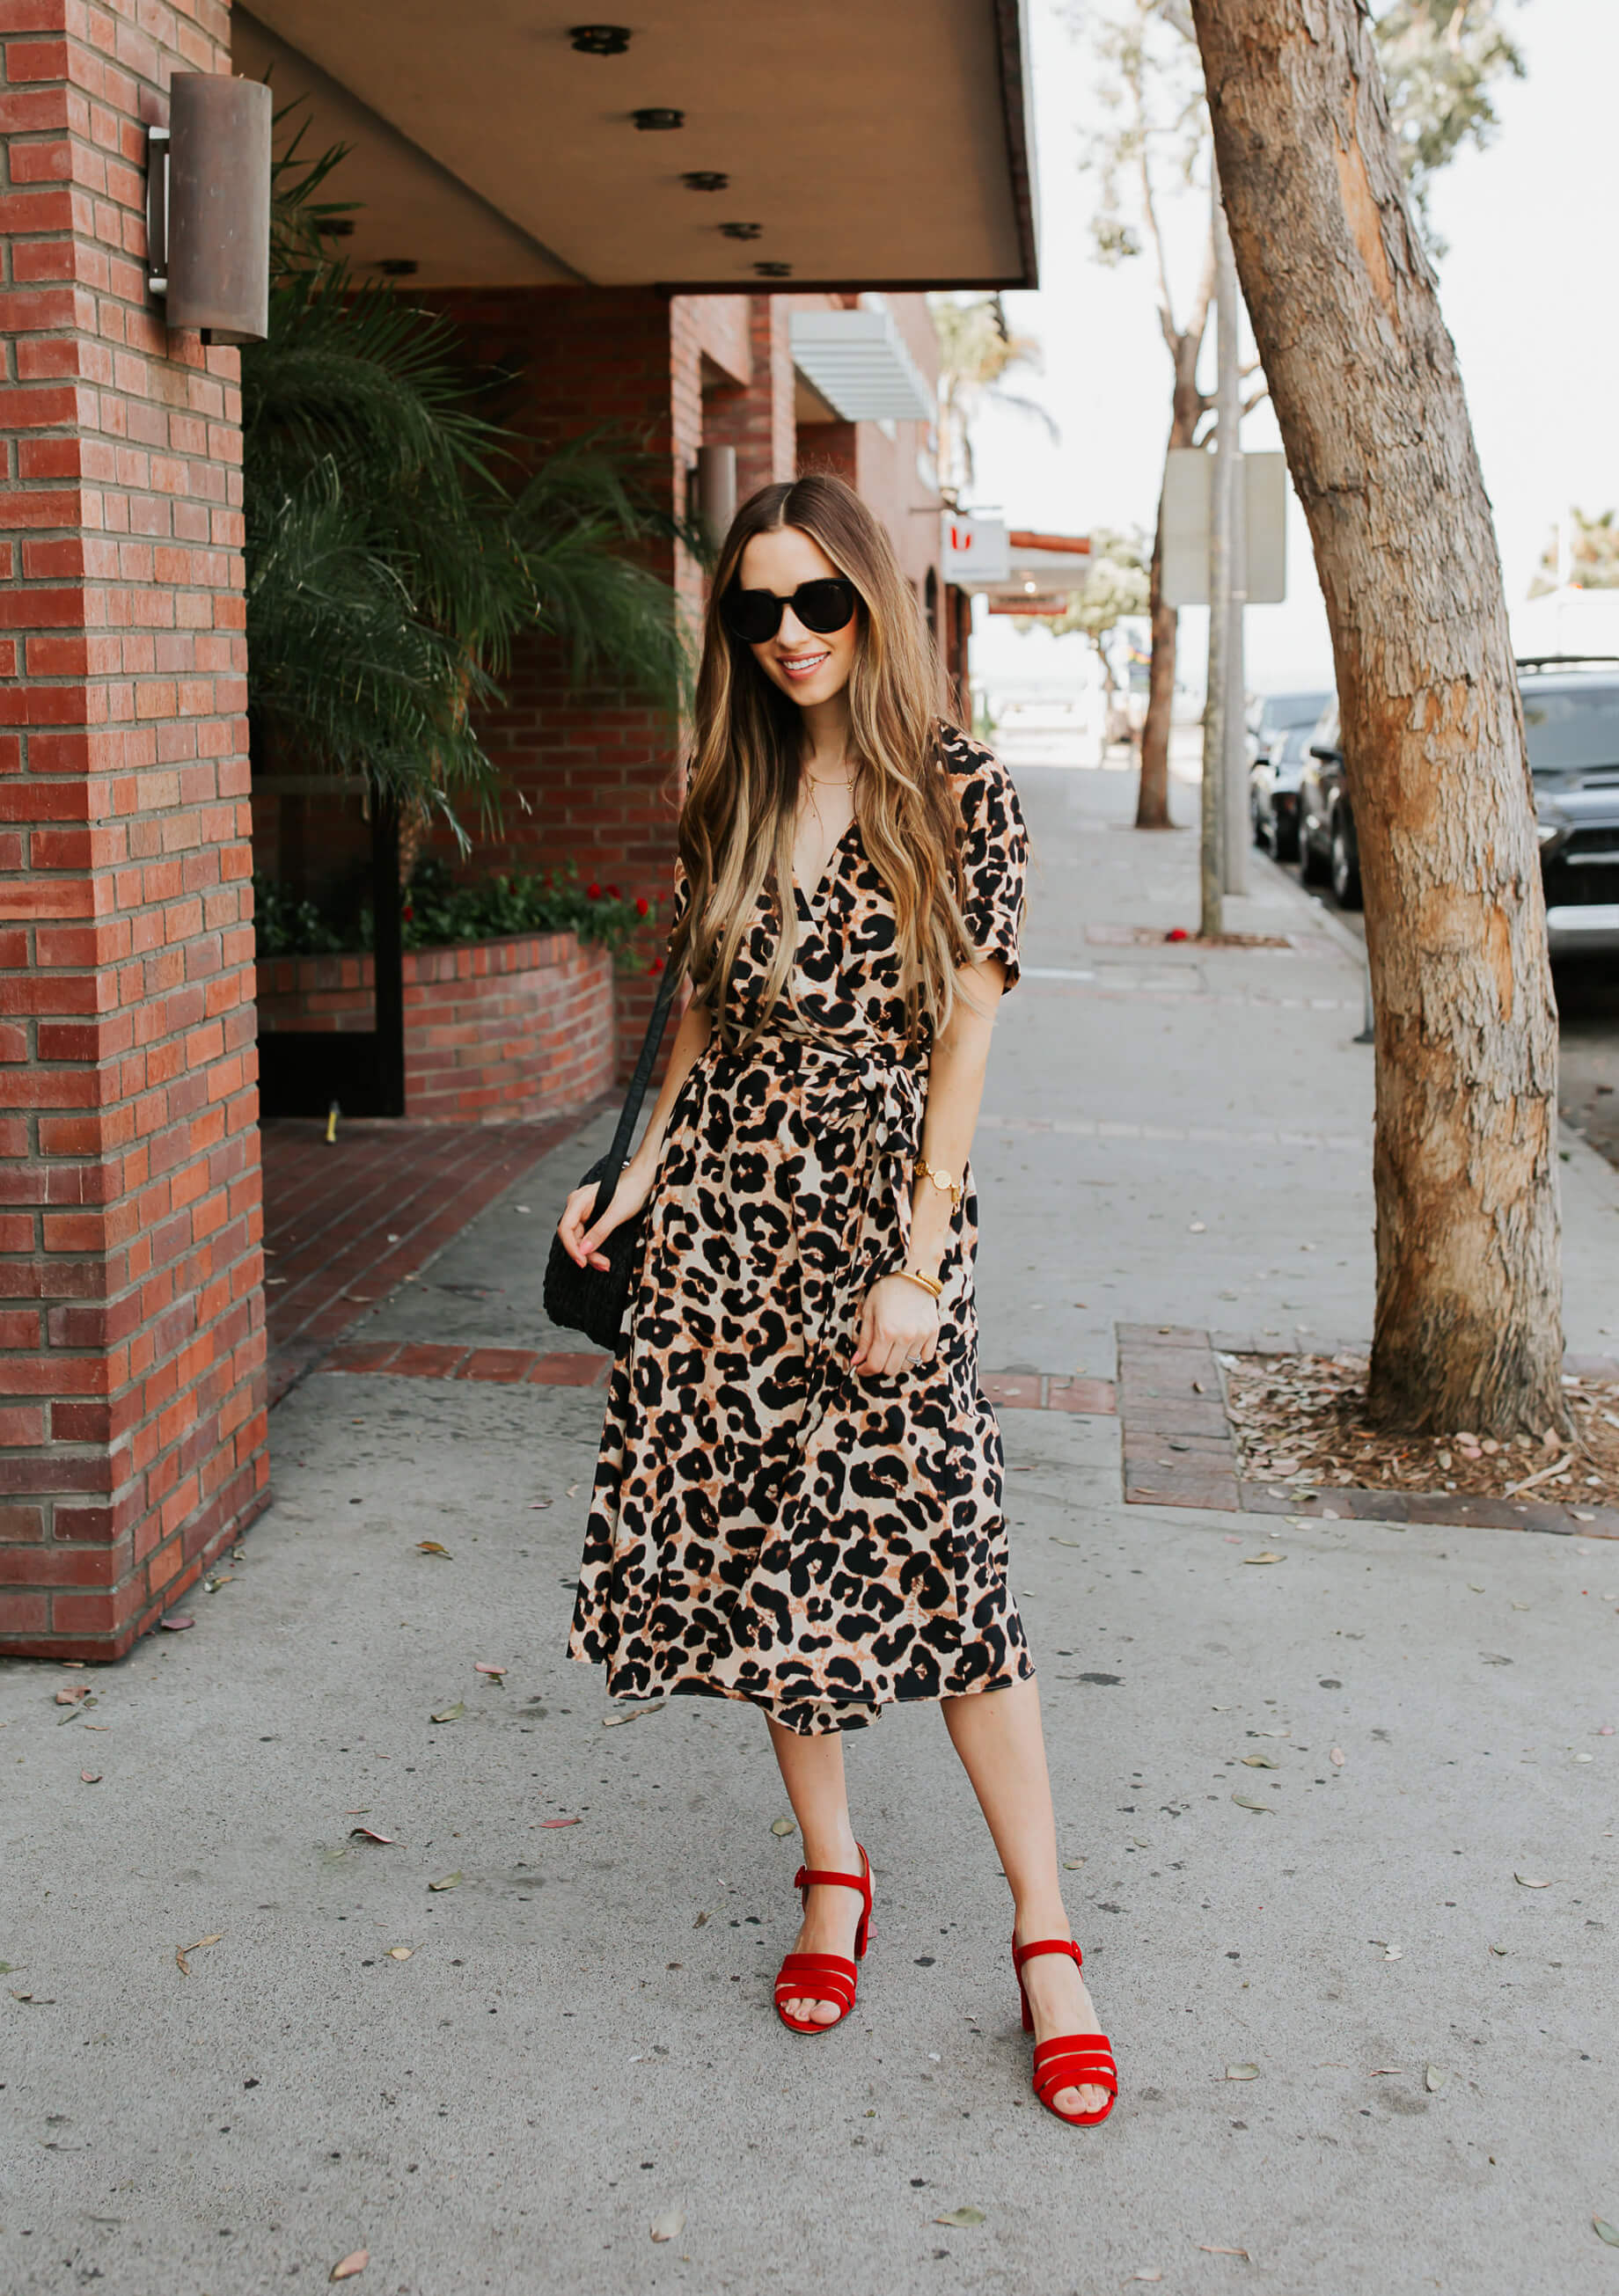 865b151edf A Classic Way to Wear Leopard Print